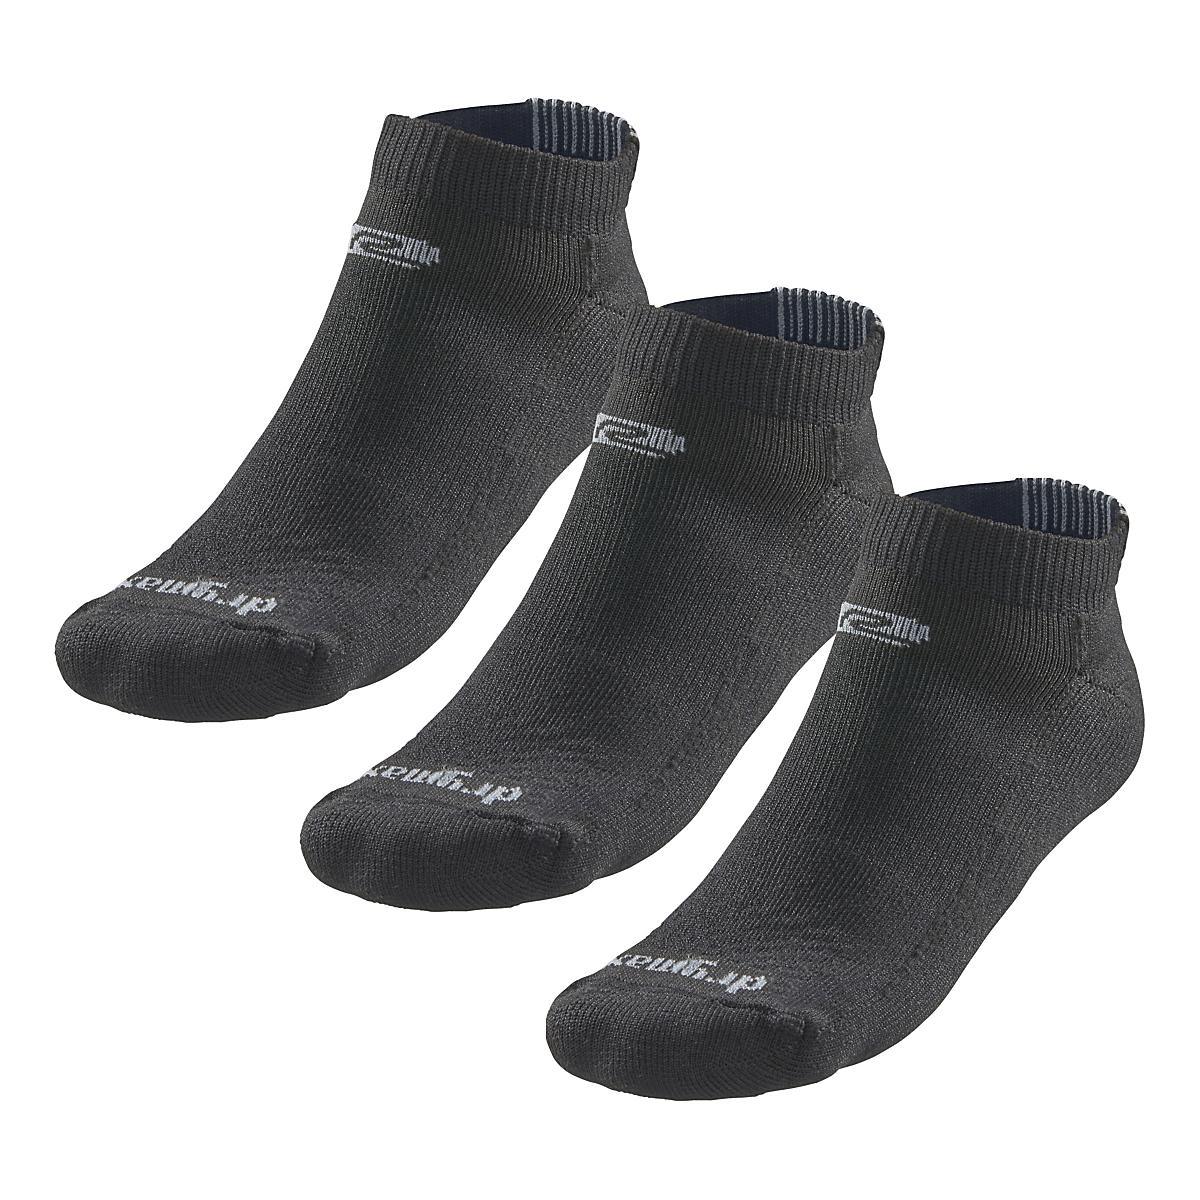 f62c226f20 Road Runner Sports Super Breathable Medium Cushion Low Cut 3 pack Socks at  Road Runner Sports